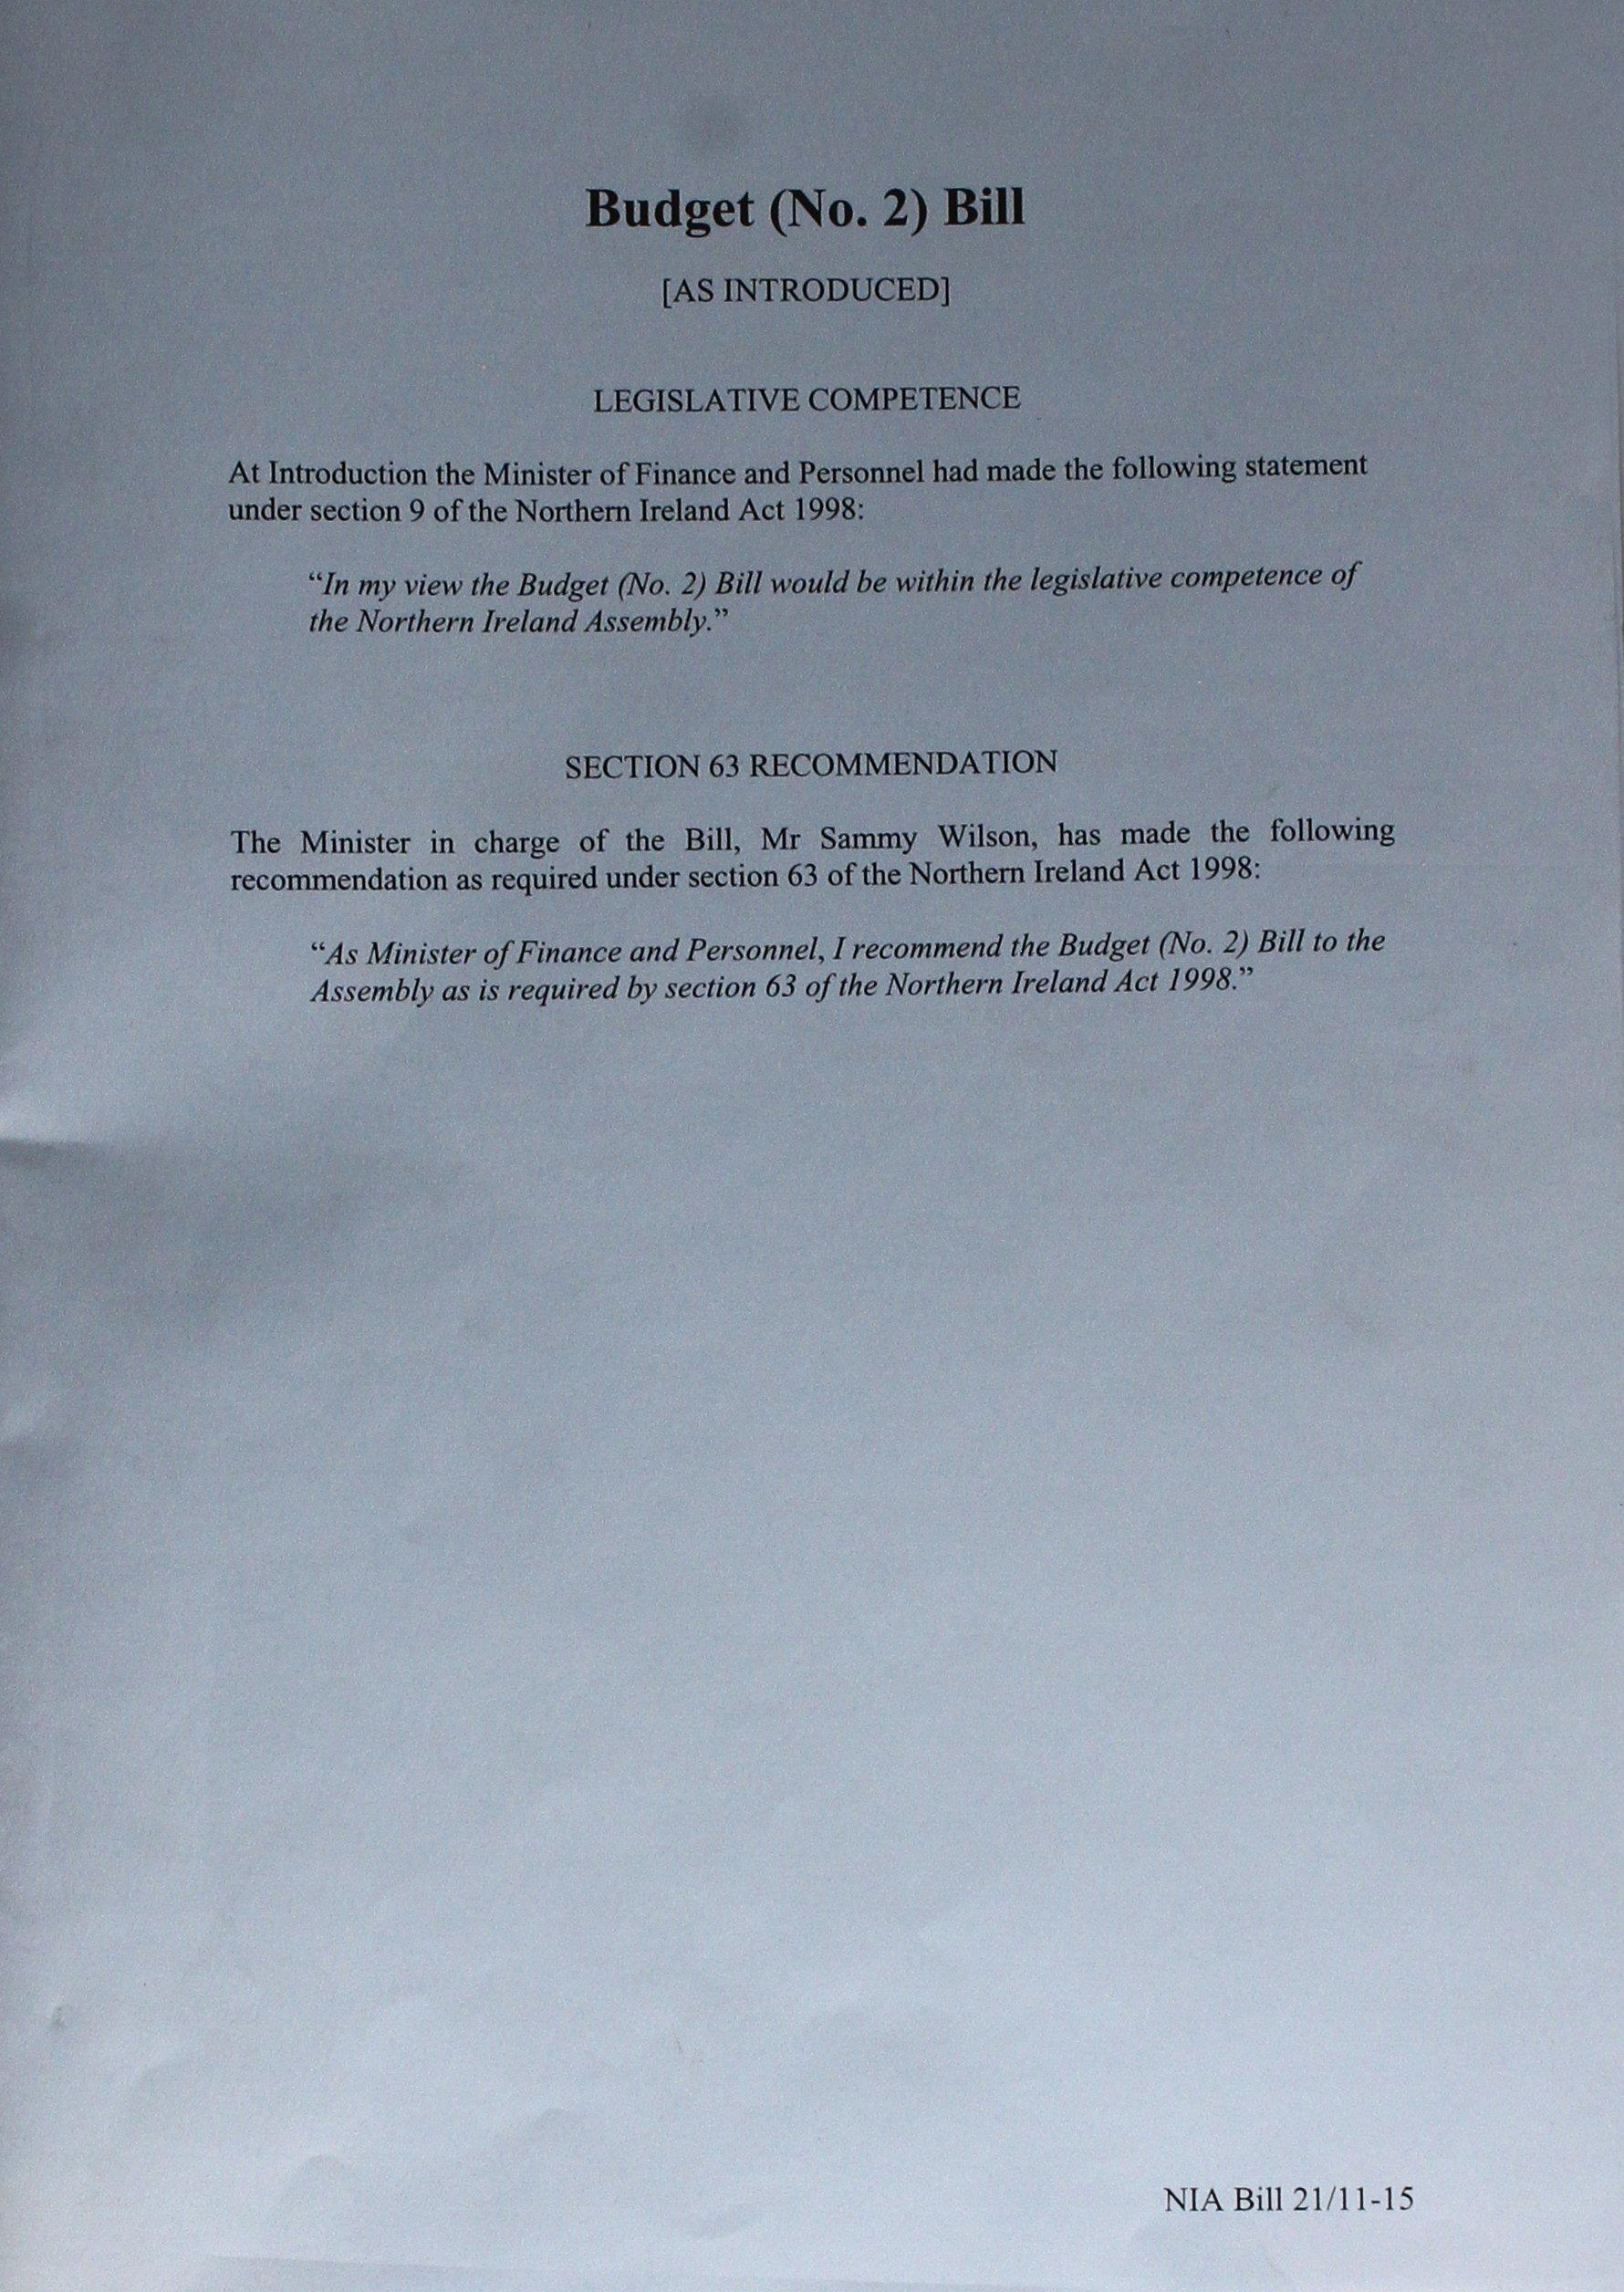 Budget (No.2) Bill: (as introduced) (Northern Ireland Assembly bills) pdf